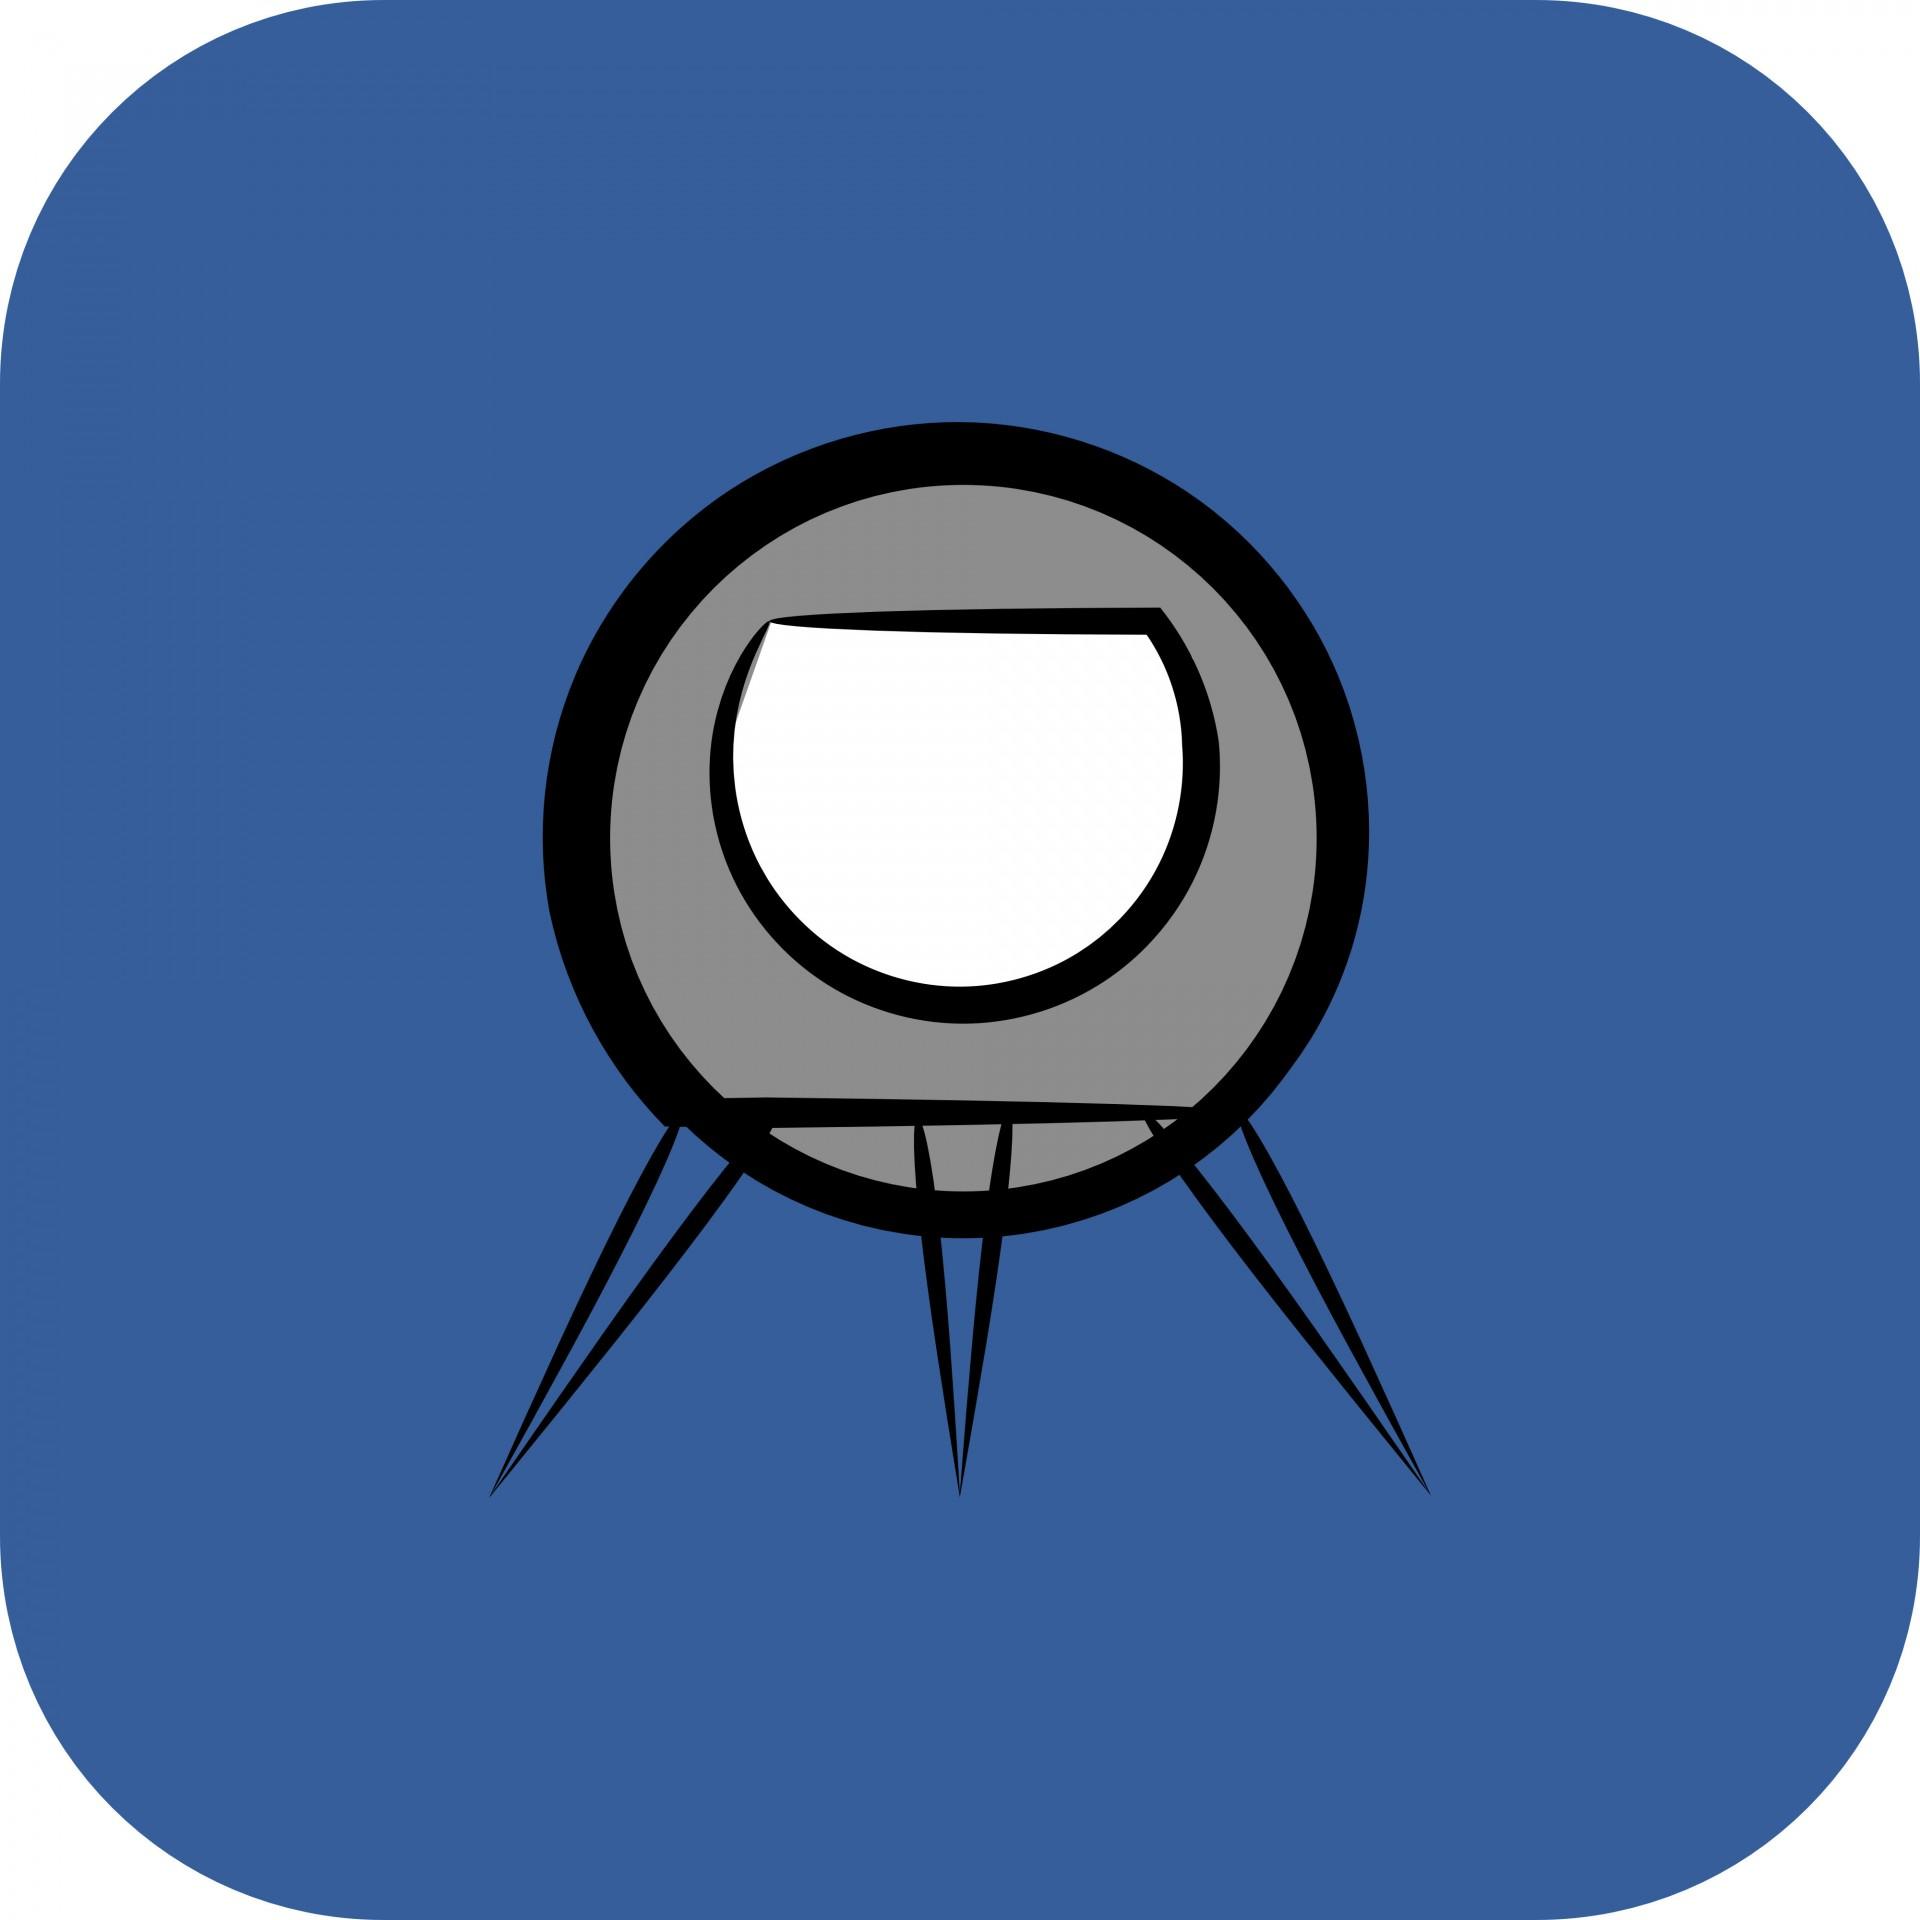 1920x1920 Rocket Ship App Icon Free Stock Photo